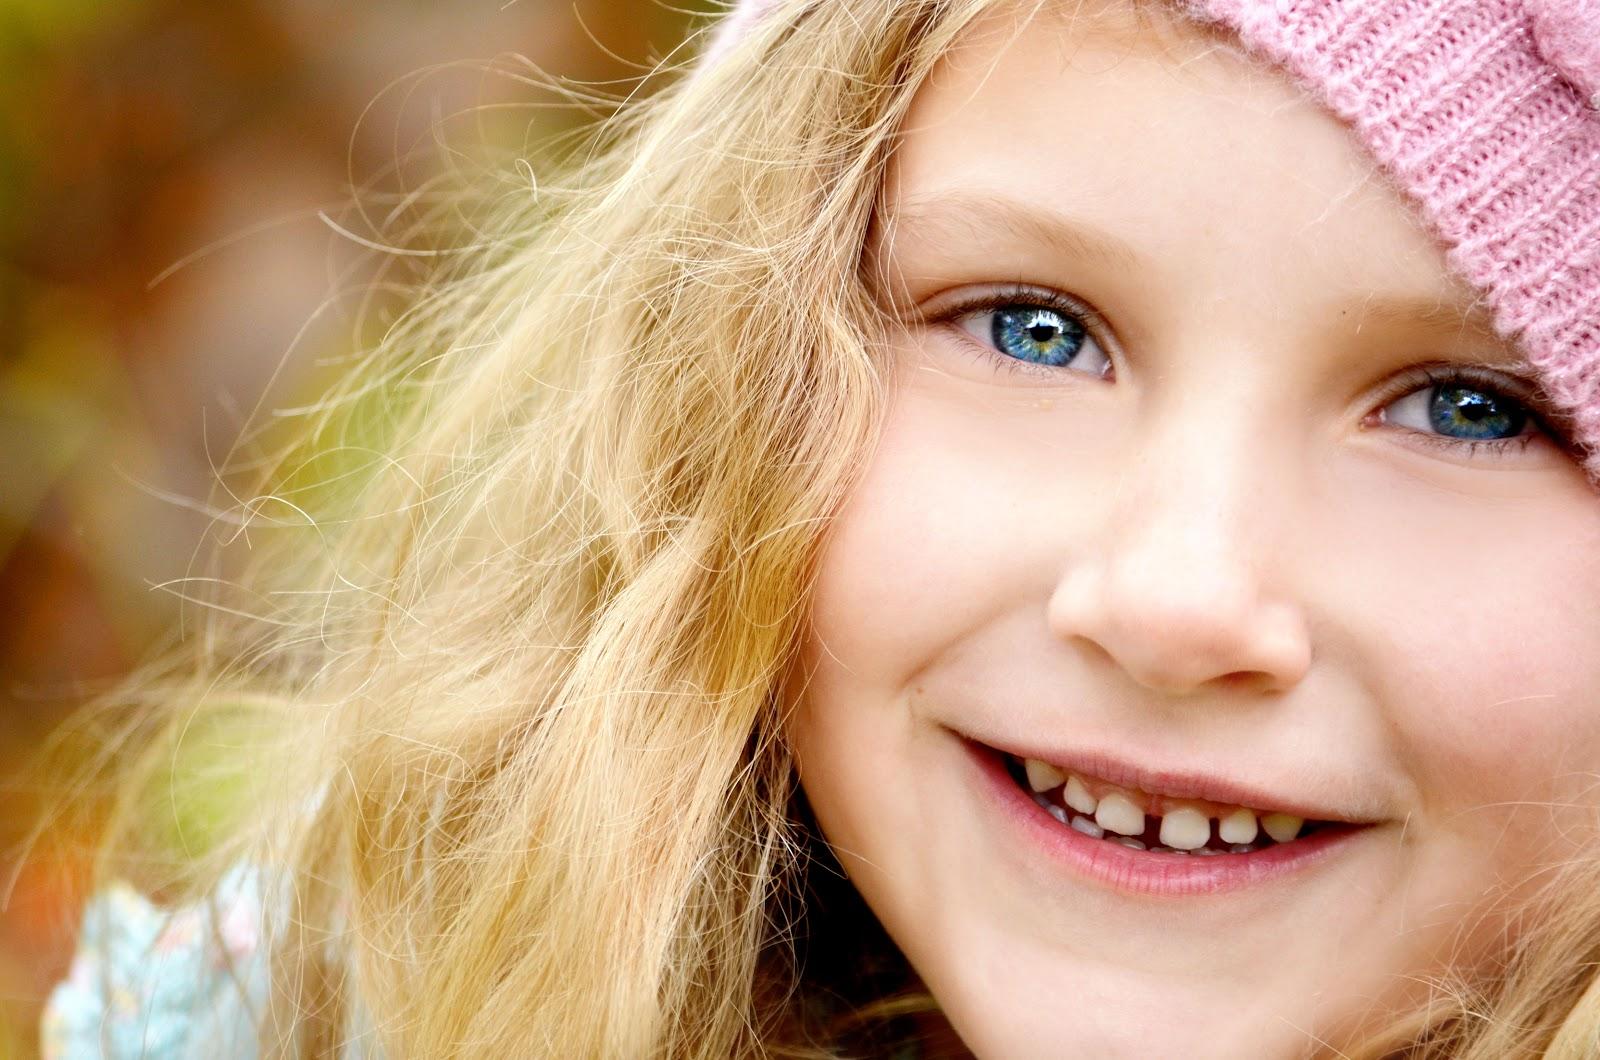 child-happy-kid-cute-48789.jpeg